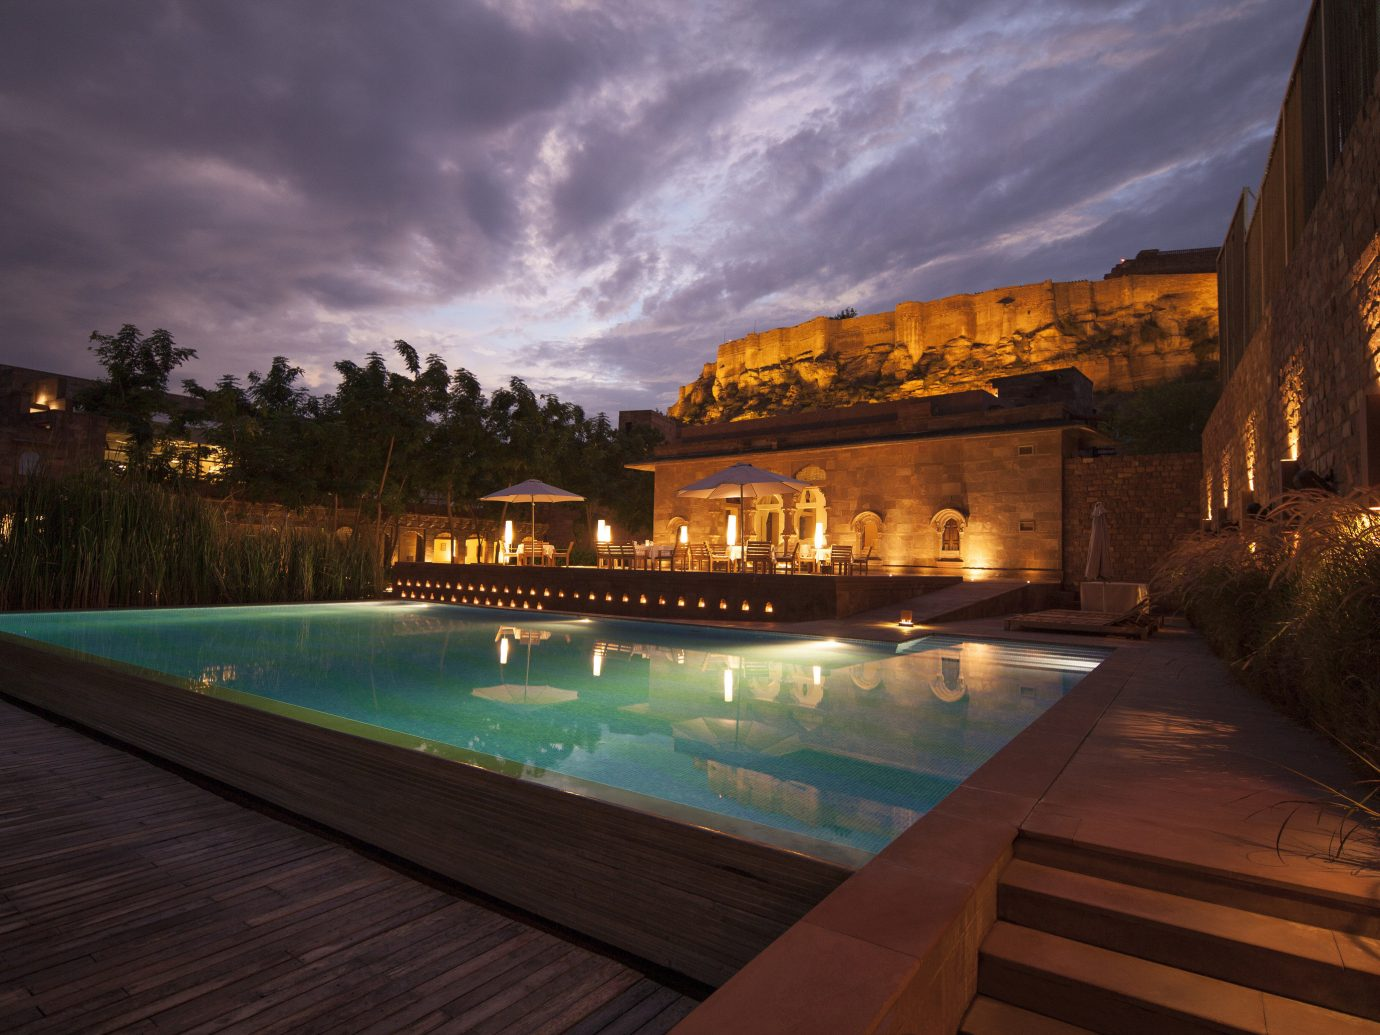 Hotels sky outdoor swimming pool estate Resort evening way mansion